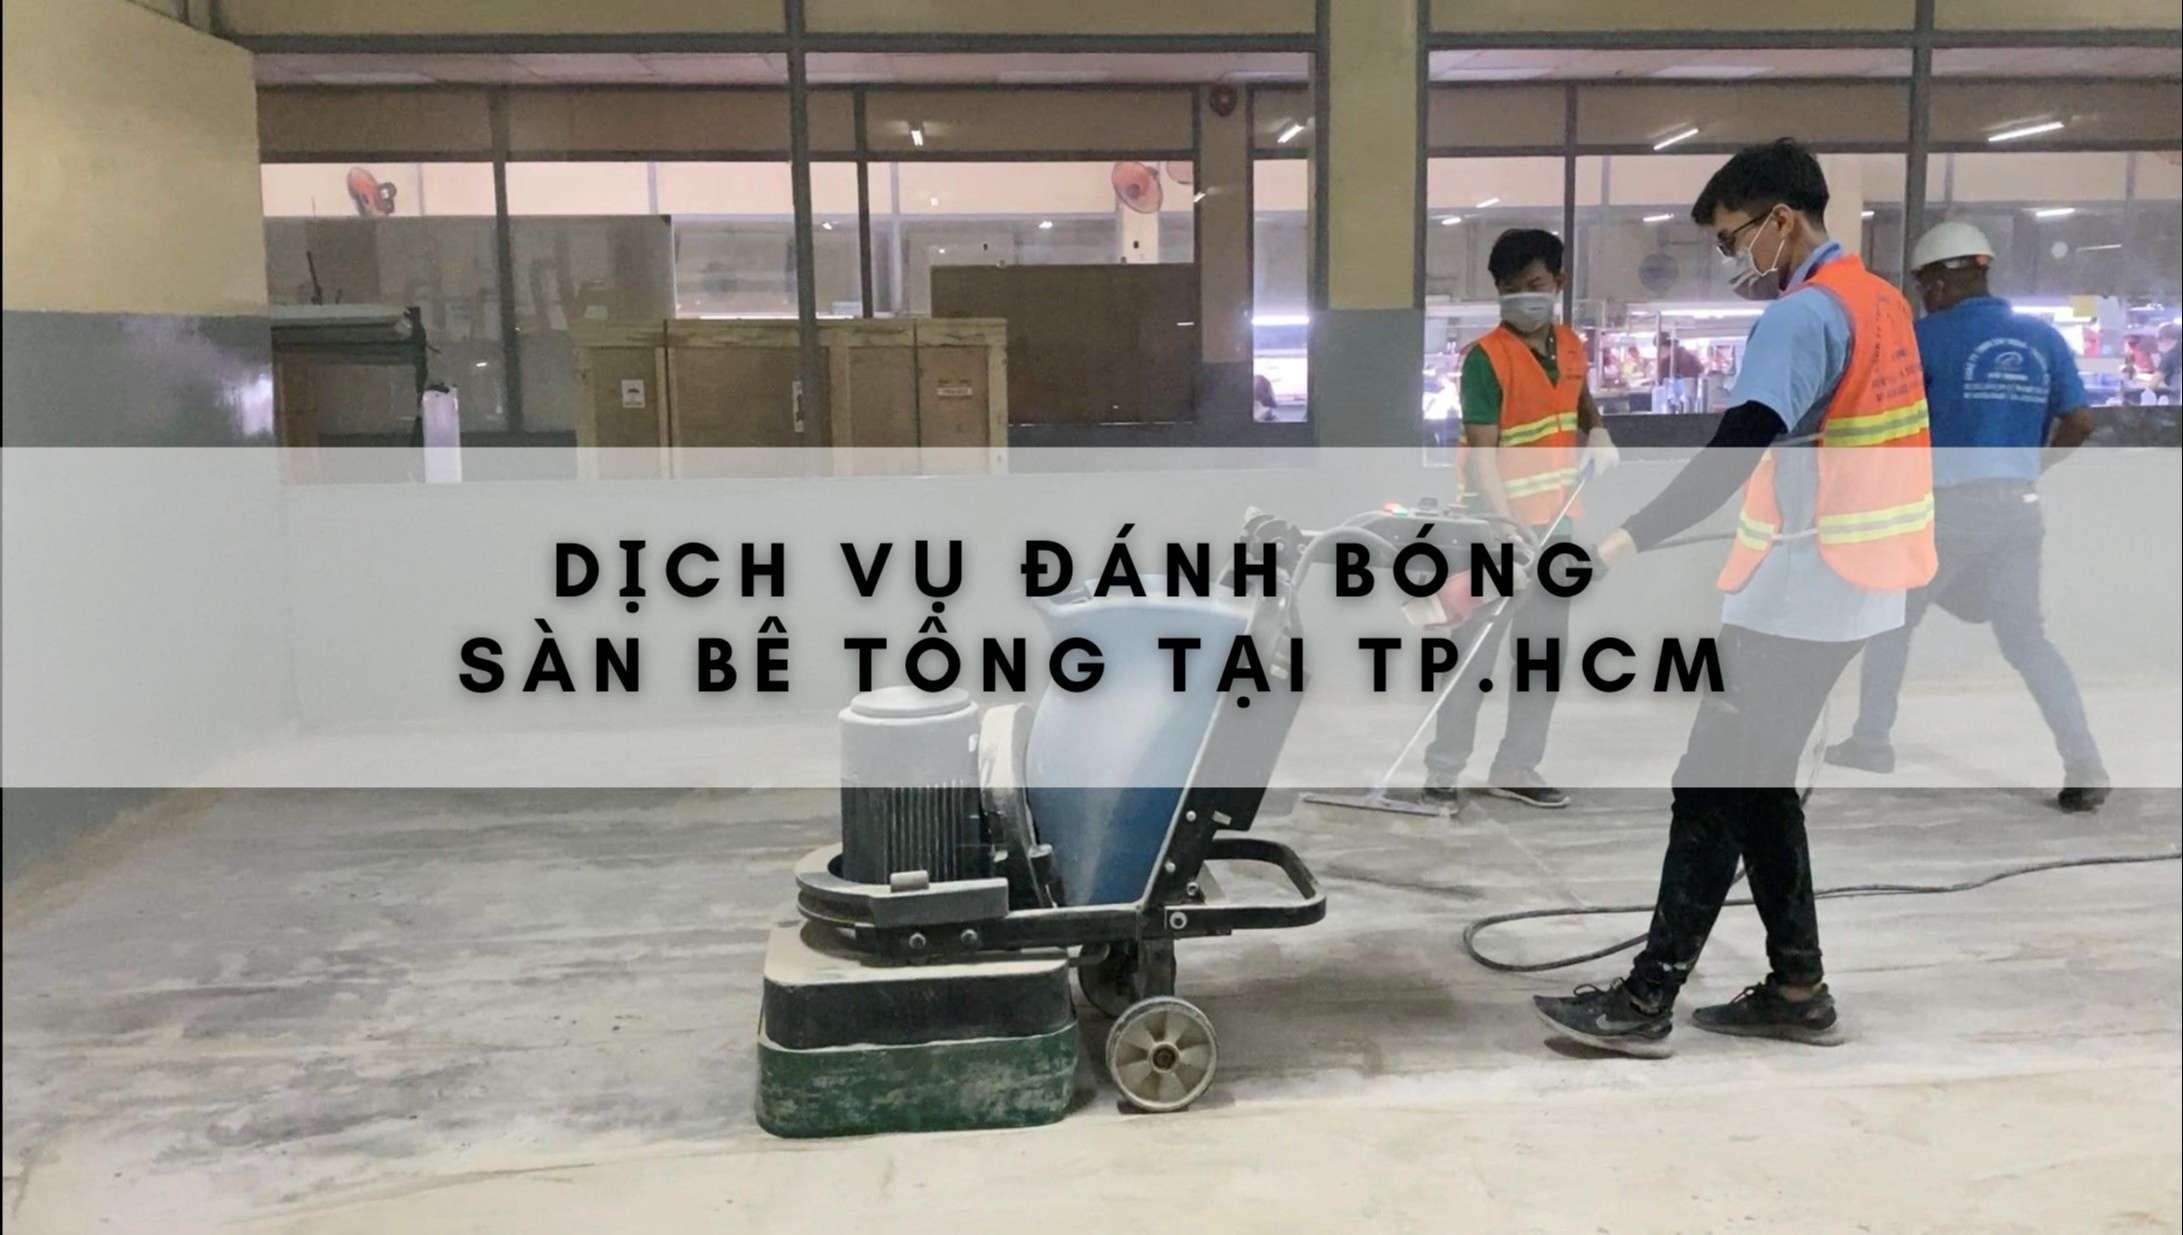 dich-vu-danh-bong-san-be-tong-tai-tphcm